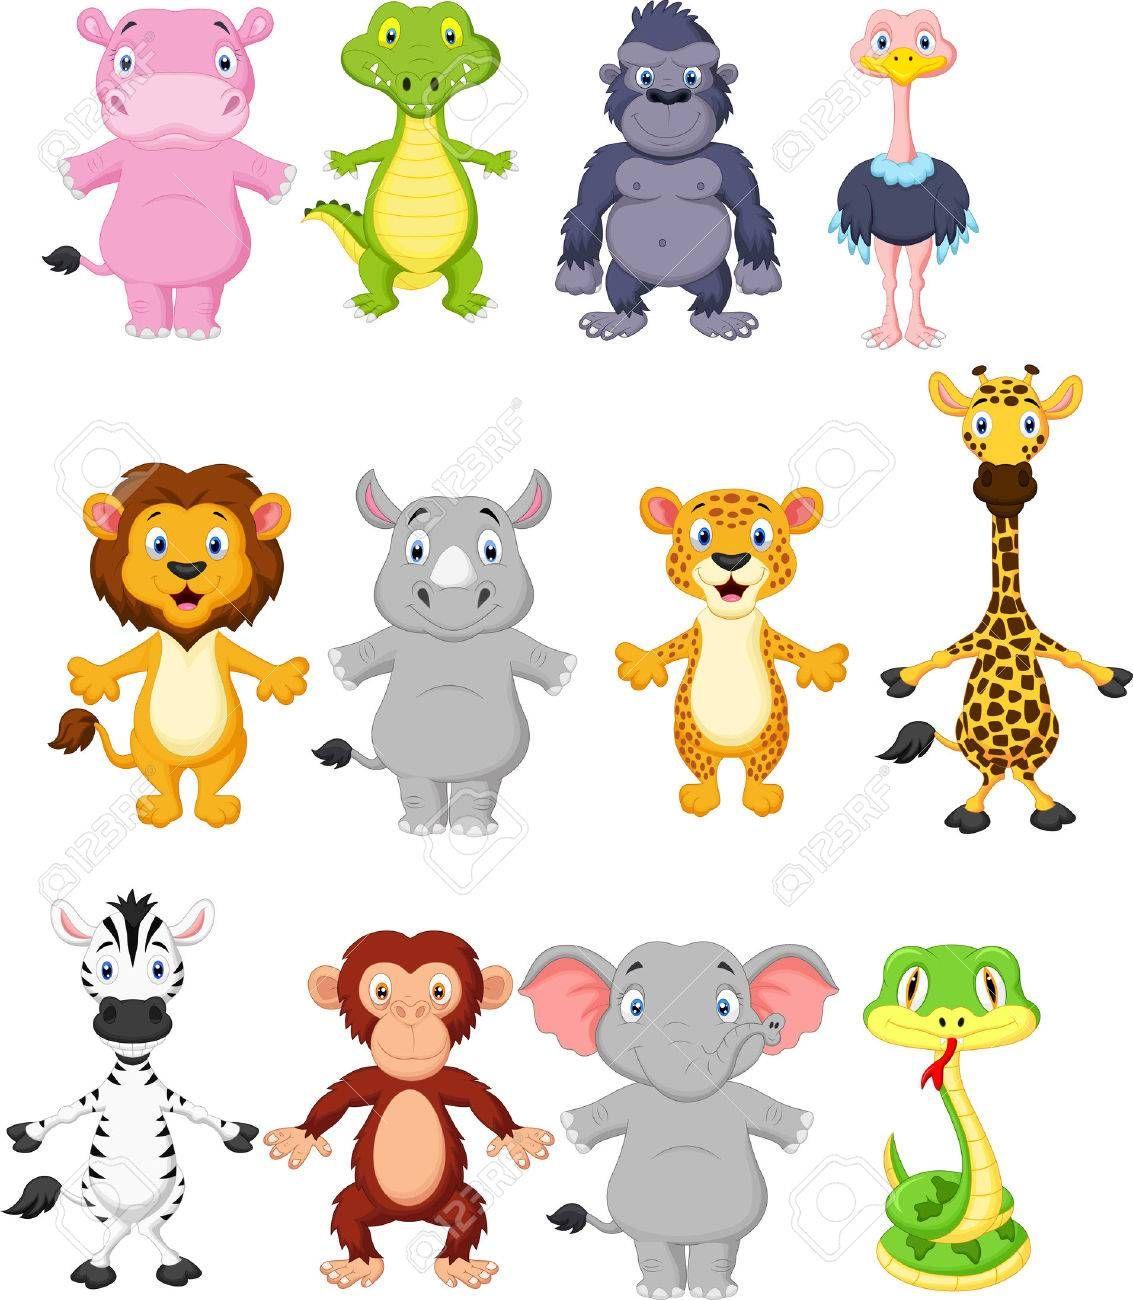 Wild Animal Cartoon Illustration Ad Animal Wild Illustration Cartoon Cute Wild Animals Wild Animals Vector Cartoon Animals